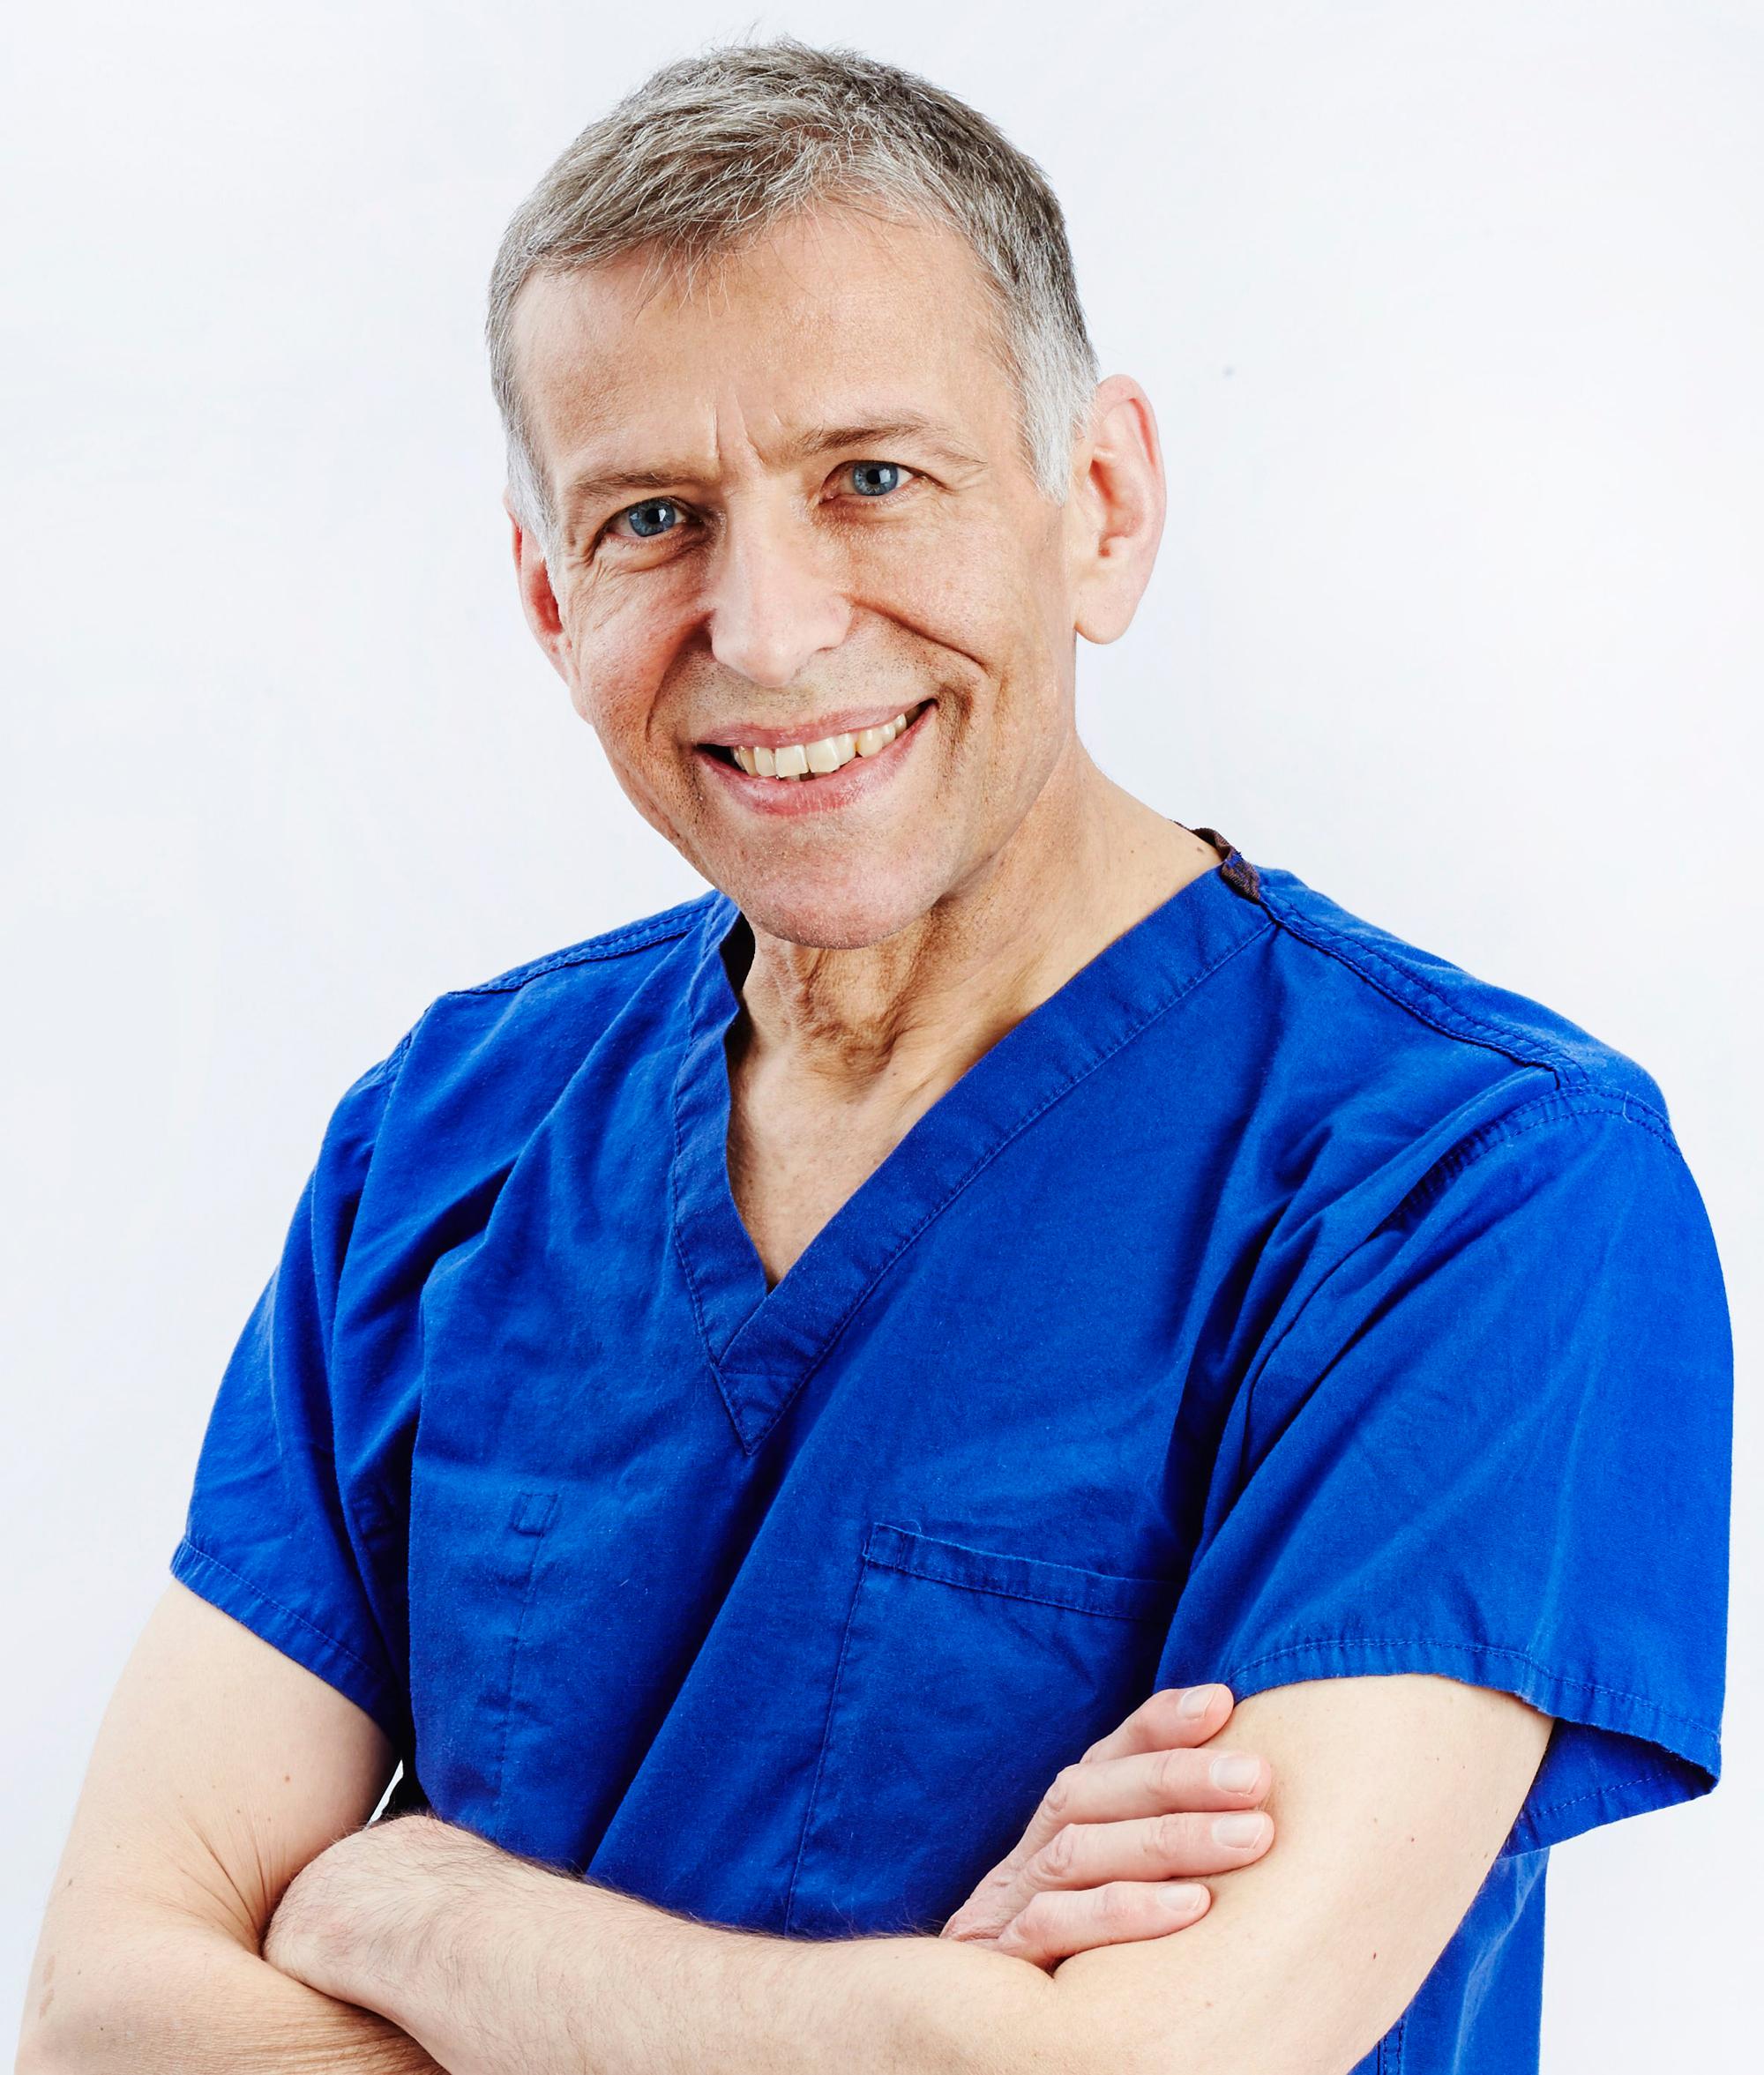 peter-baranyovits-eye-specialist-northamptonshire.jpg